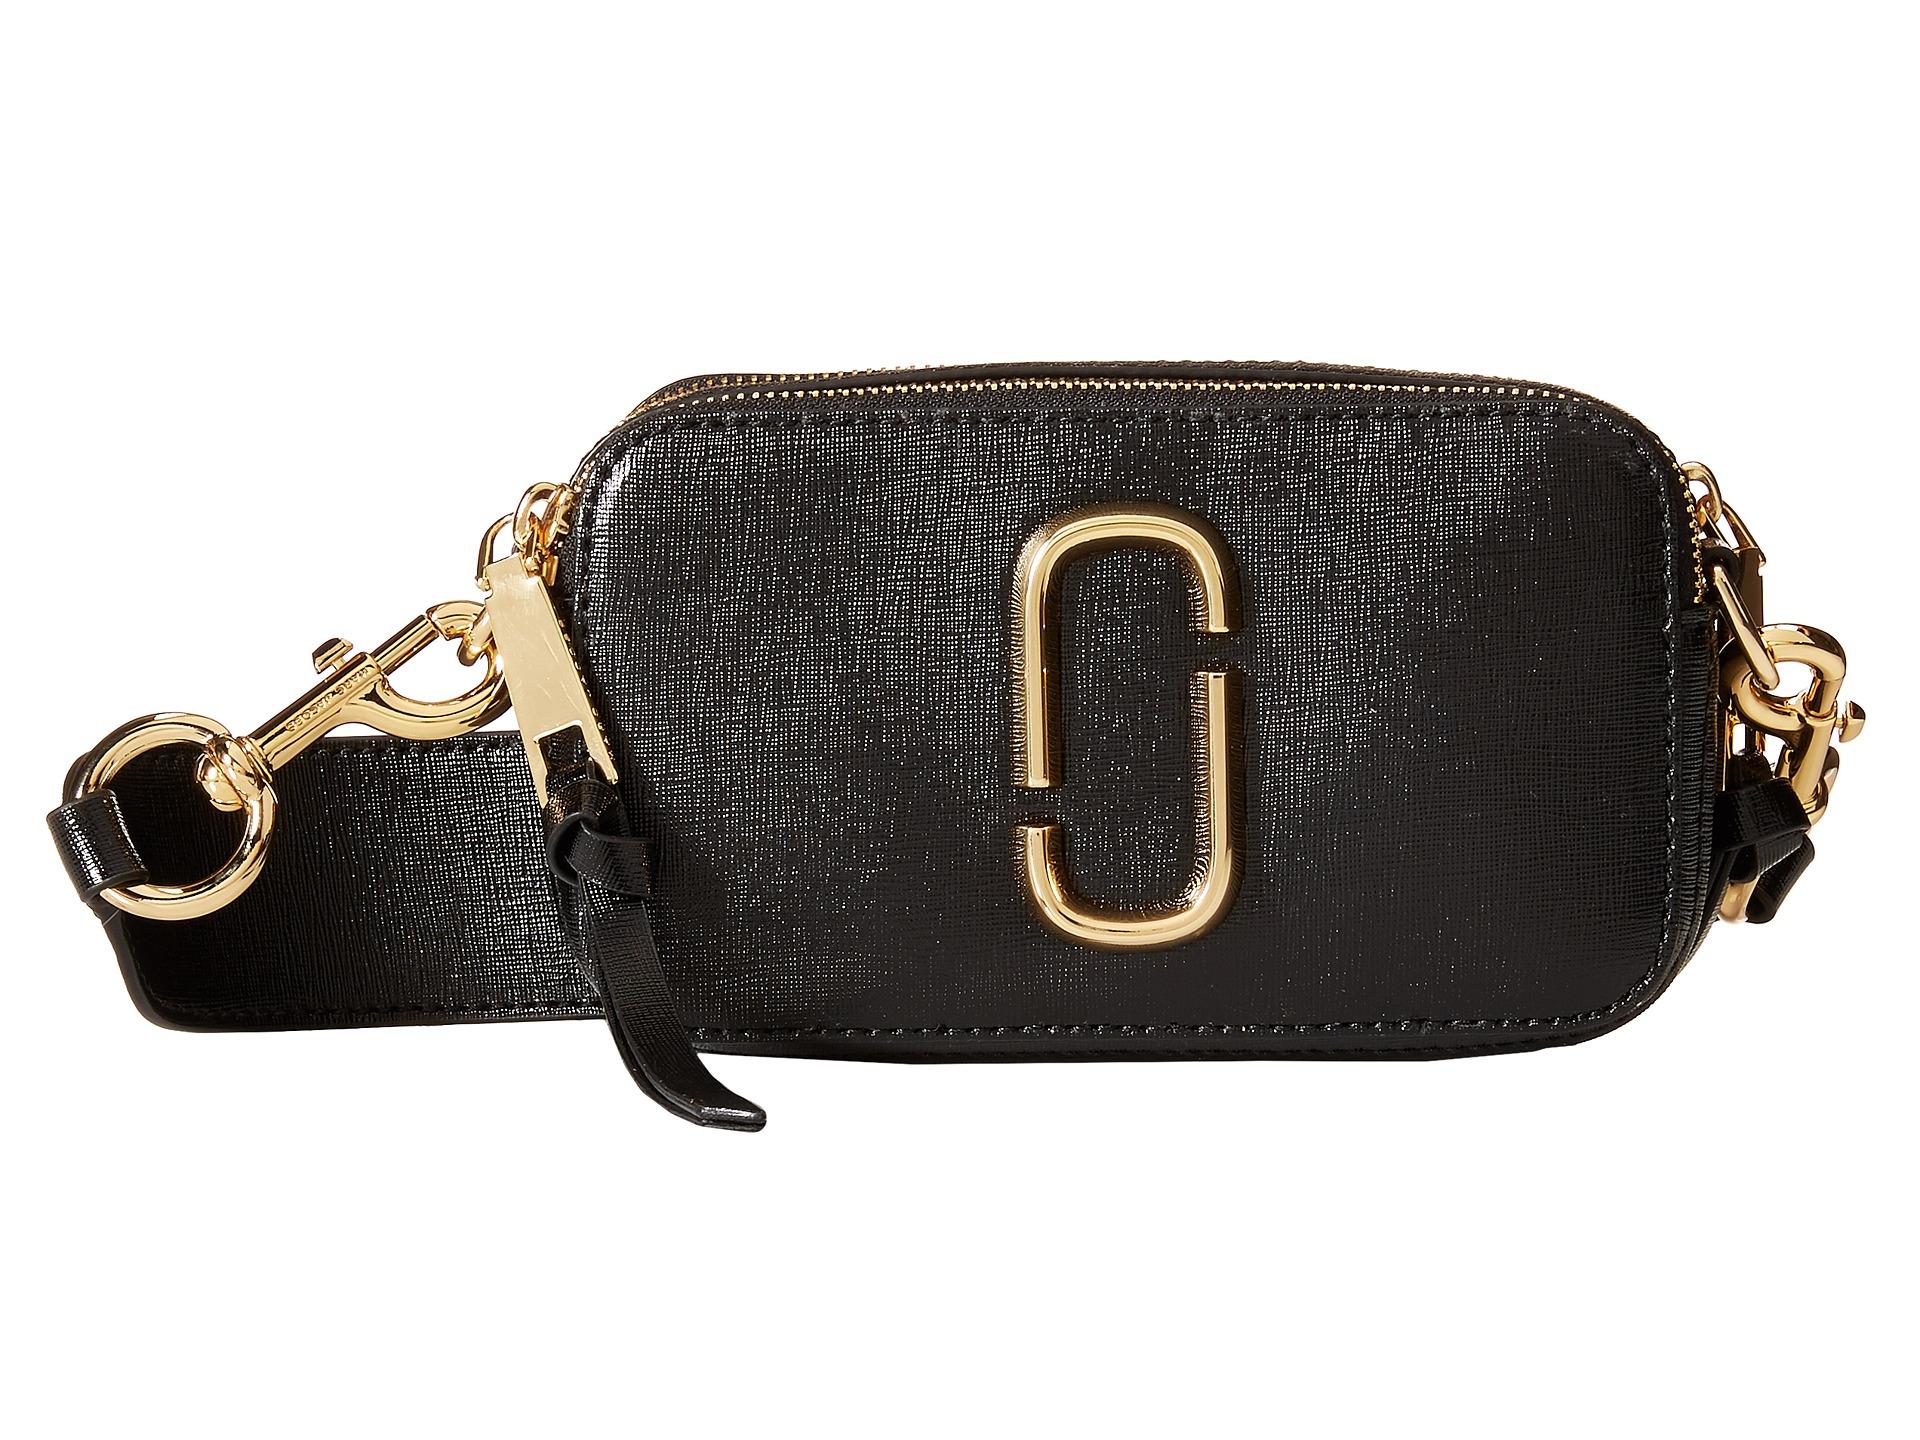 b4b60be6ecb Marc Jacobs Snapshot Color Block Saffiano Small Camera Bag in Black ...